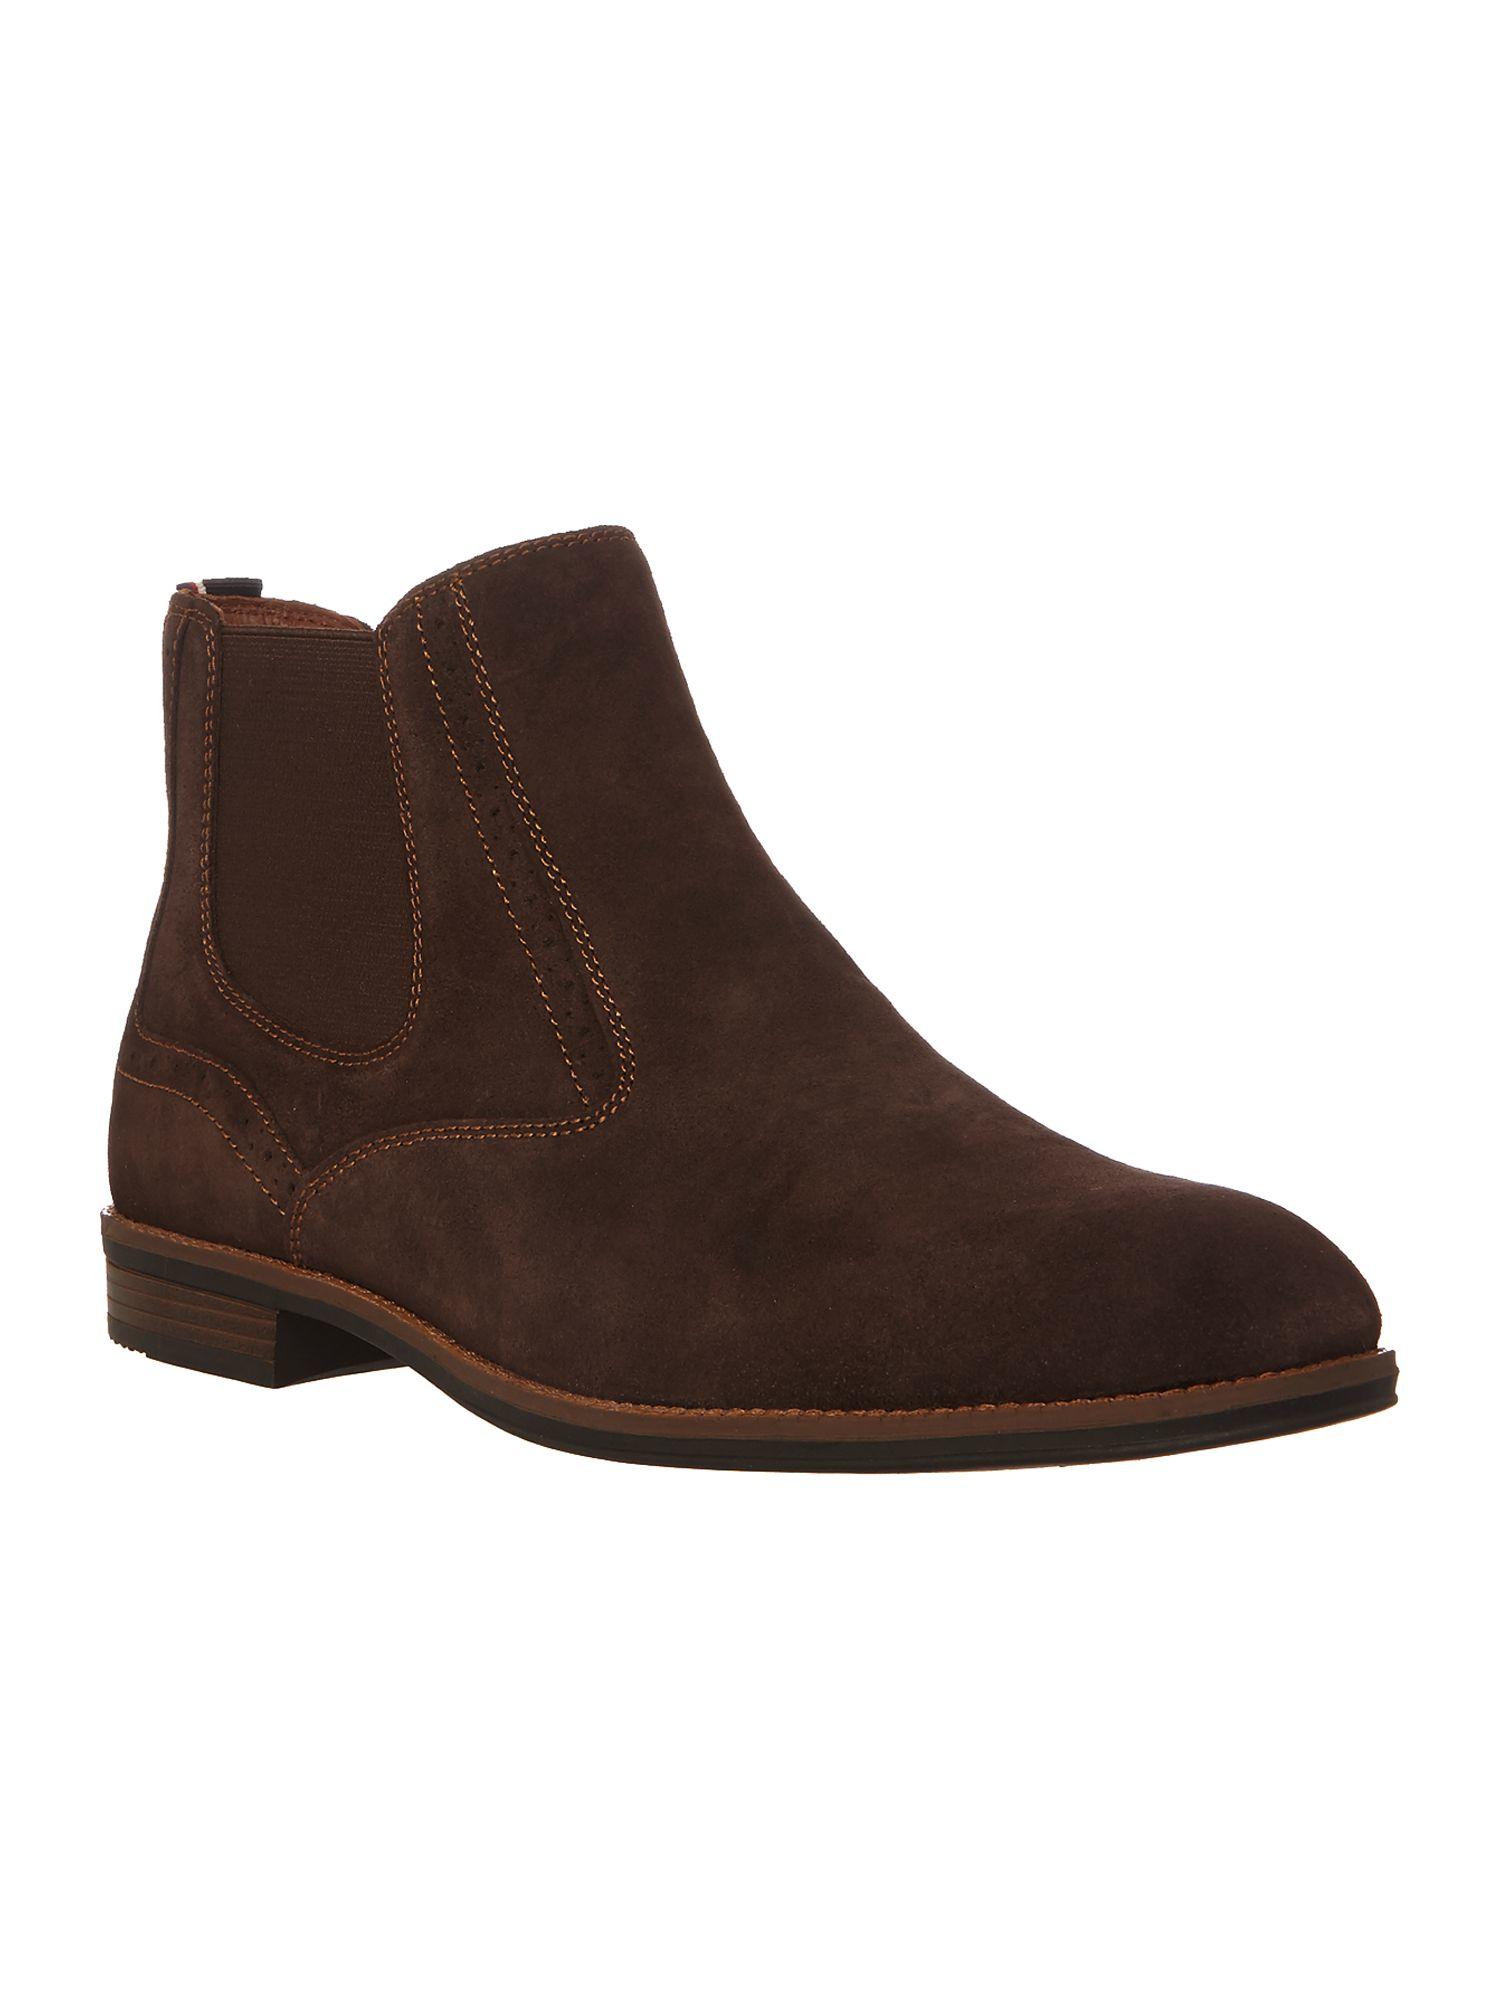 tommy hilfiger colton chelsea boots in brown for men lyst. Black Bedroom Furniture Sets. Home Design Ideas